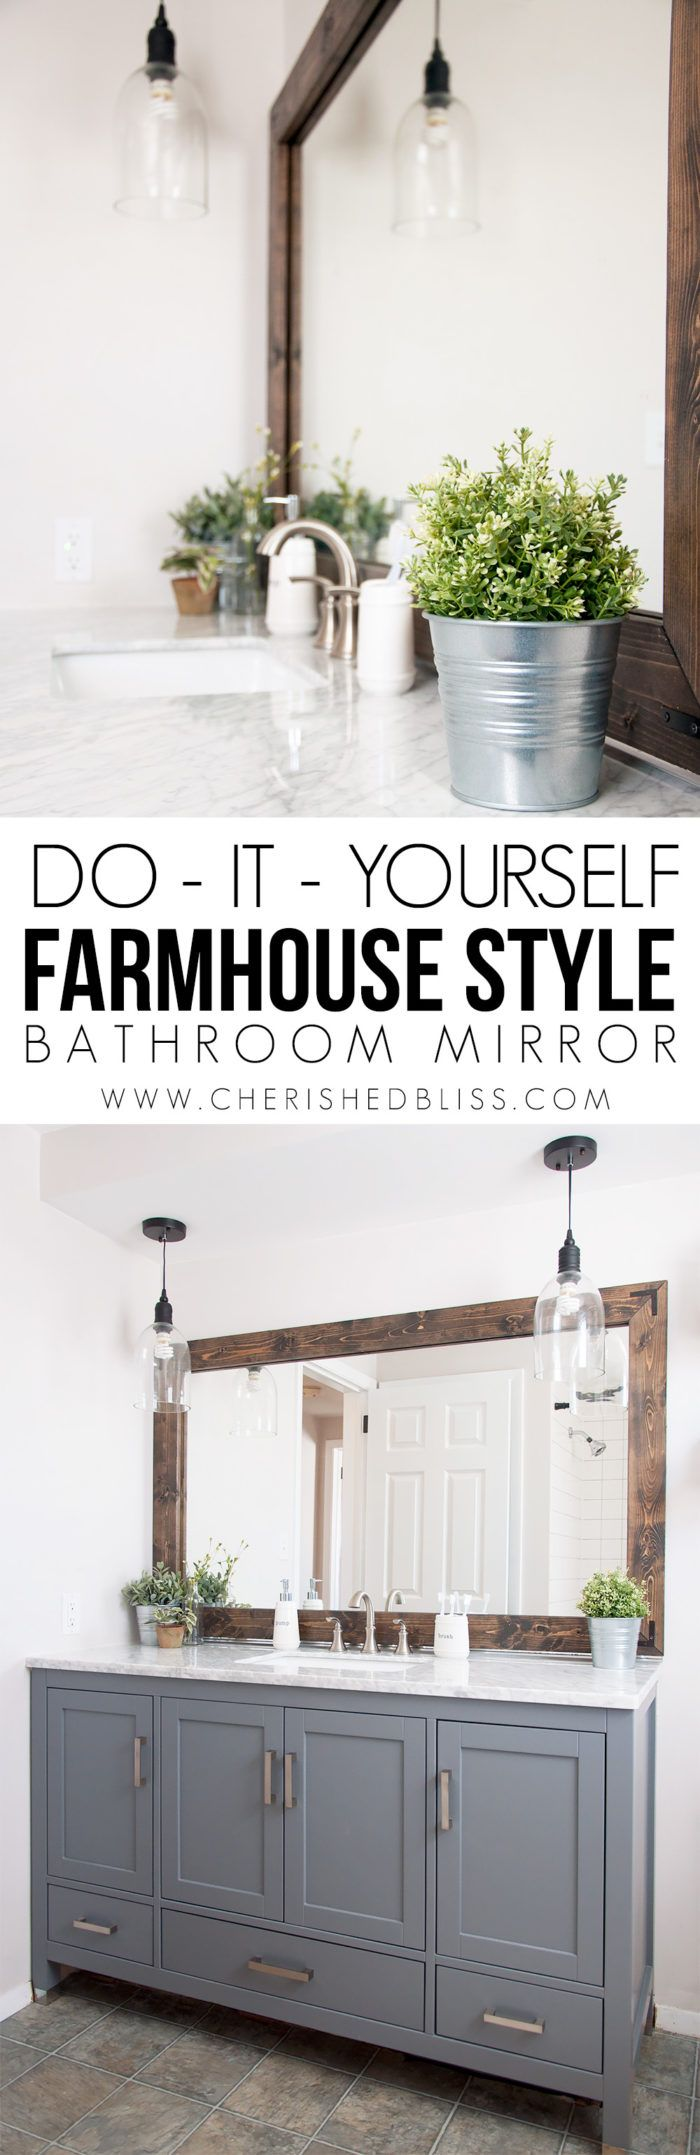 Bathroom Mirror You Look Fine farmhouse bathroom mirror tutorial | farmhouse style bathrooms